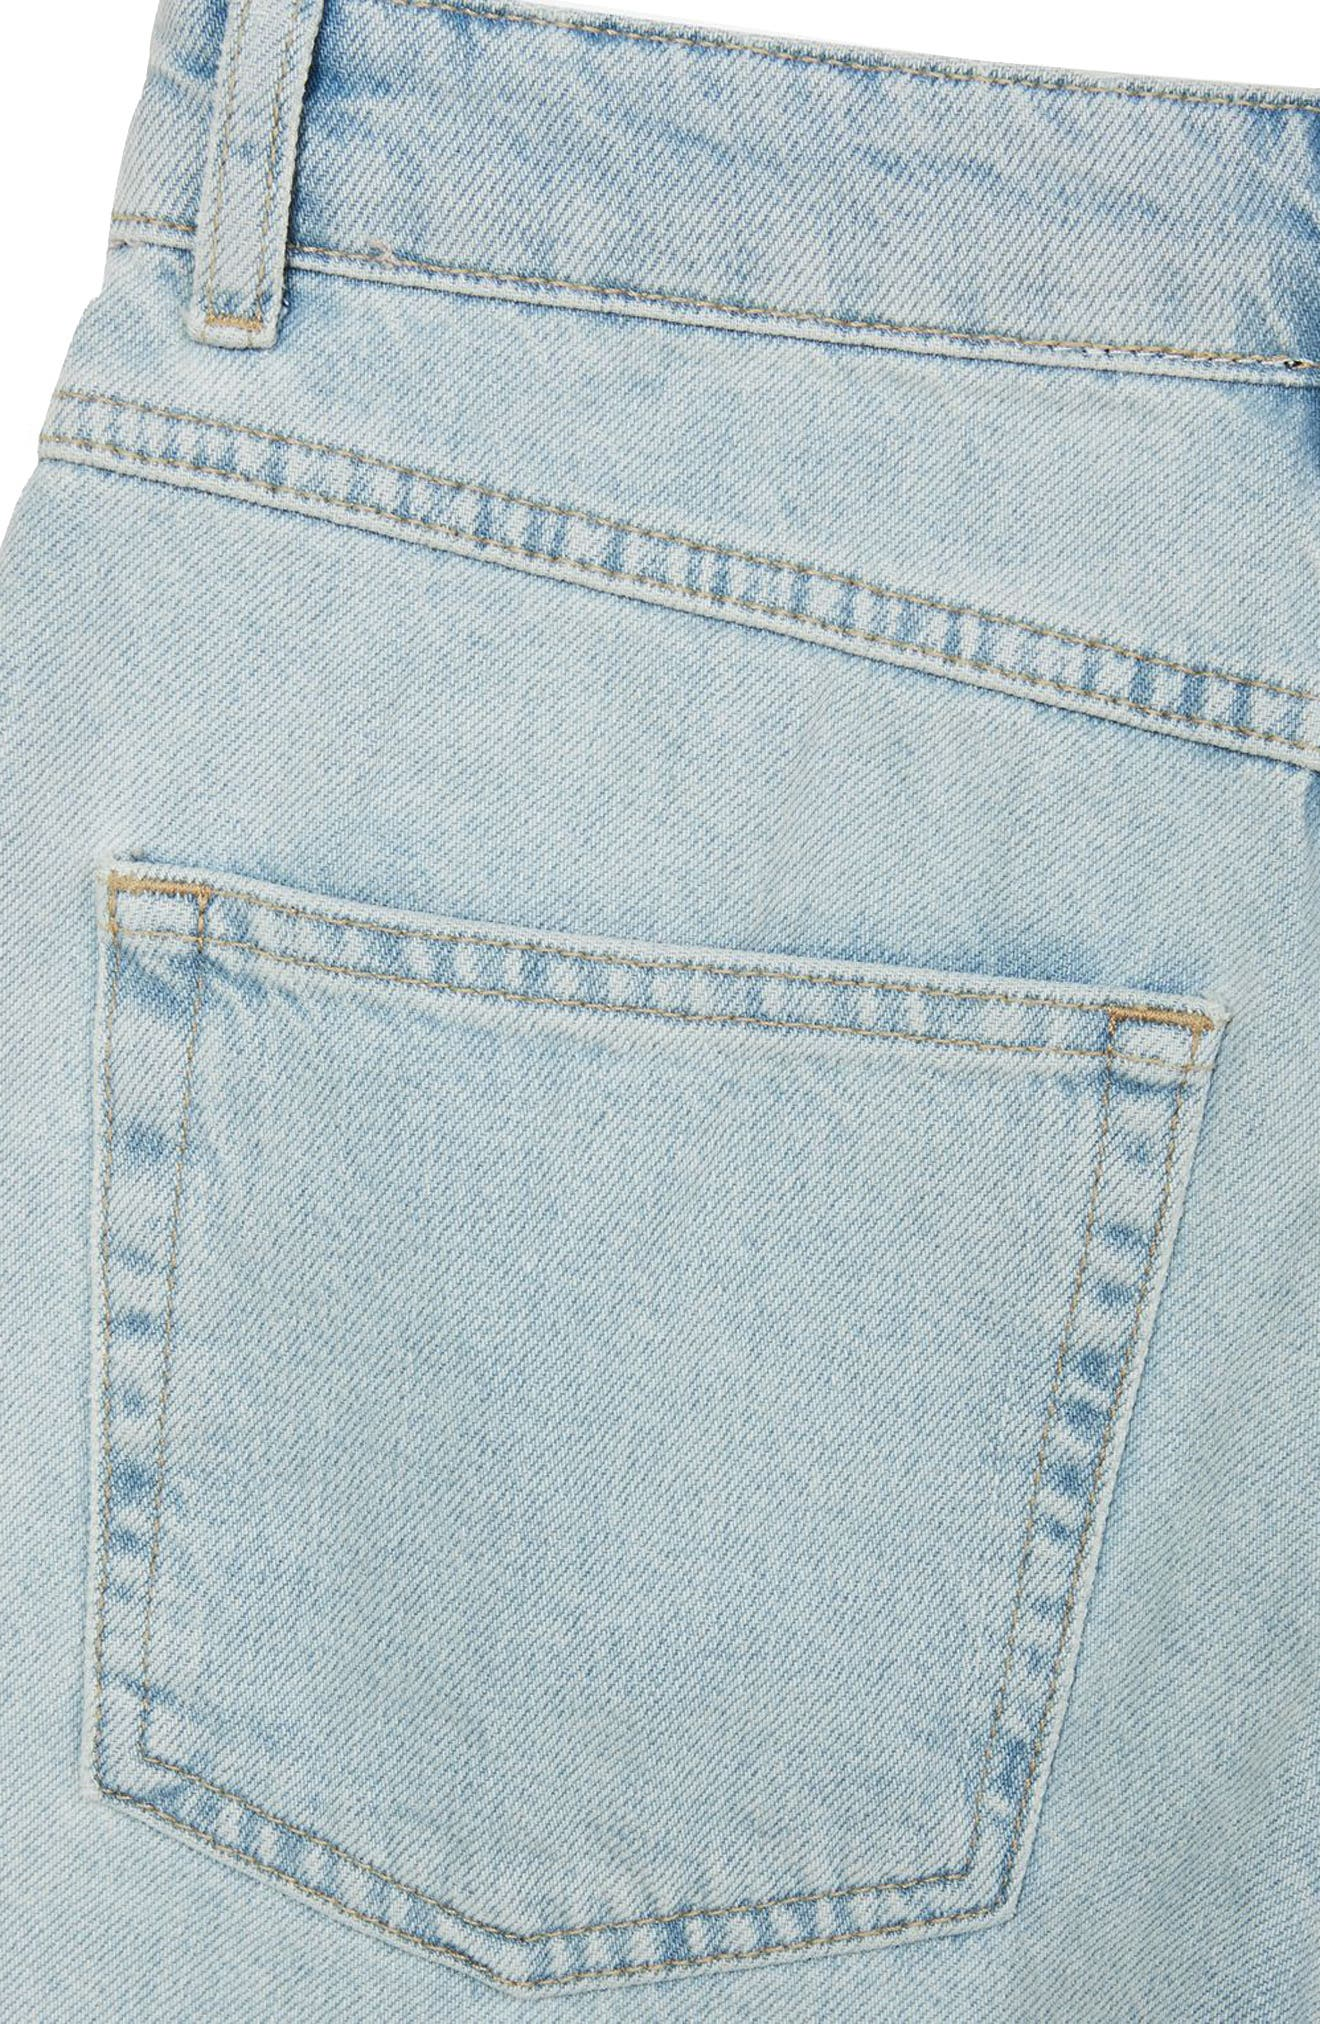 Bleach Denim Board Shorts,                             Alternate thumbnail 9, color,                             420